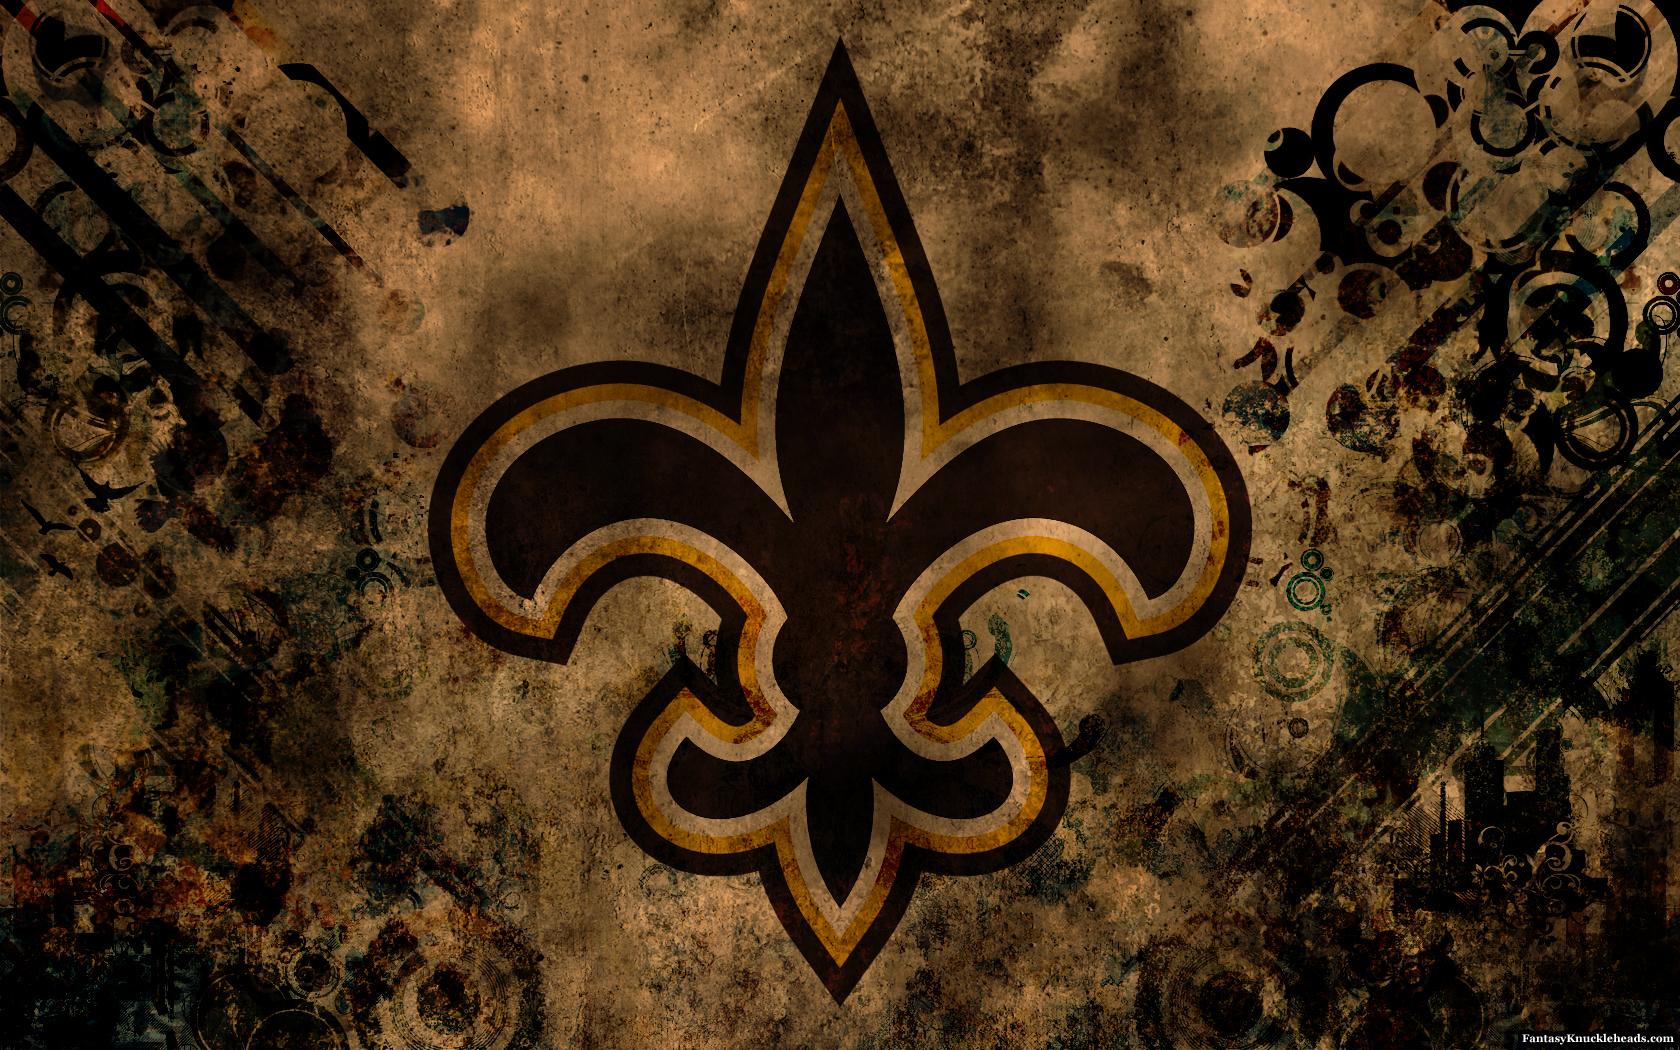 New Orleans Saints wallpaper HD background